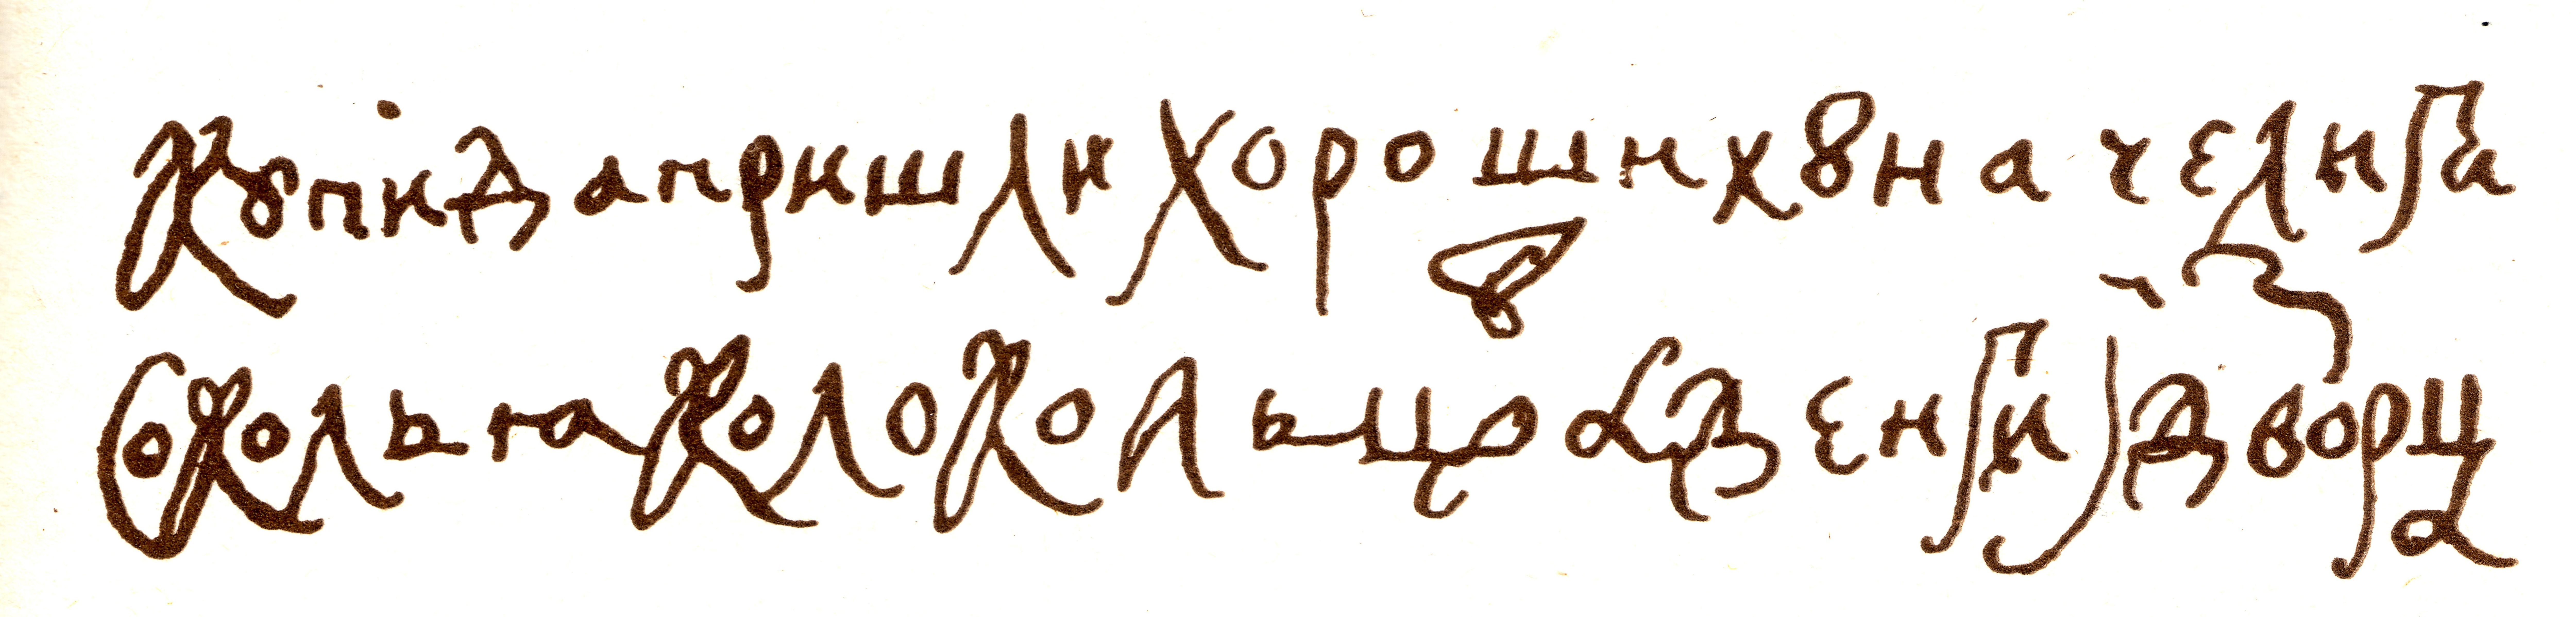 Автограф царя Алексея Михайловича Сытин 3века 1912.jpg